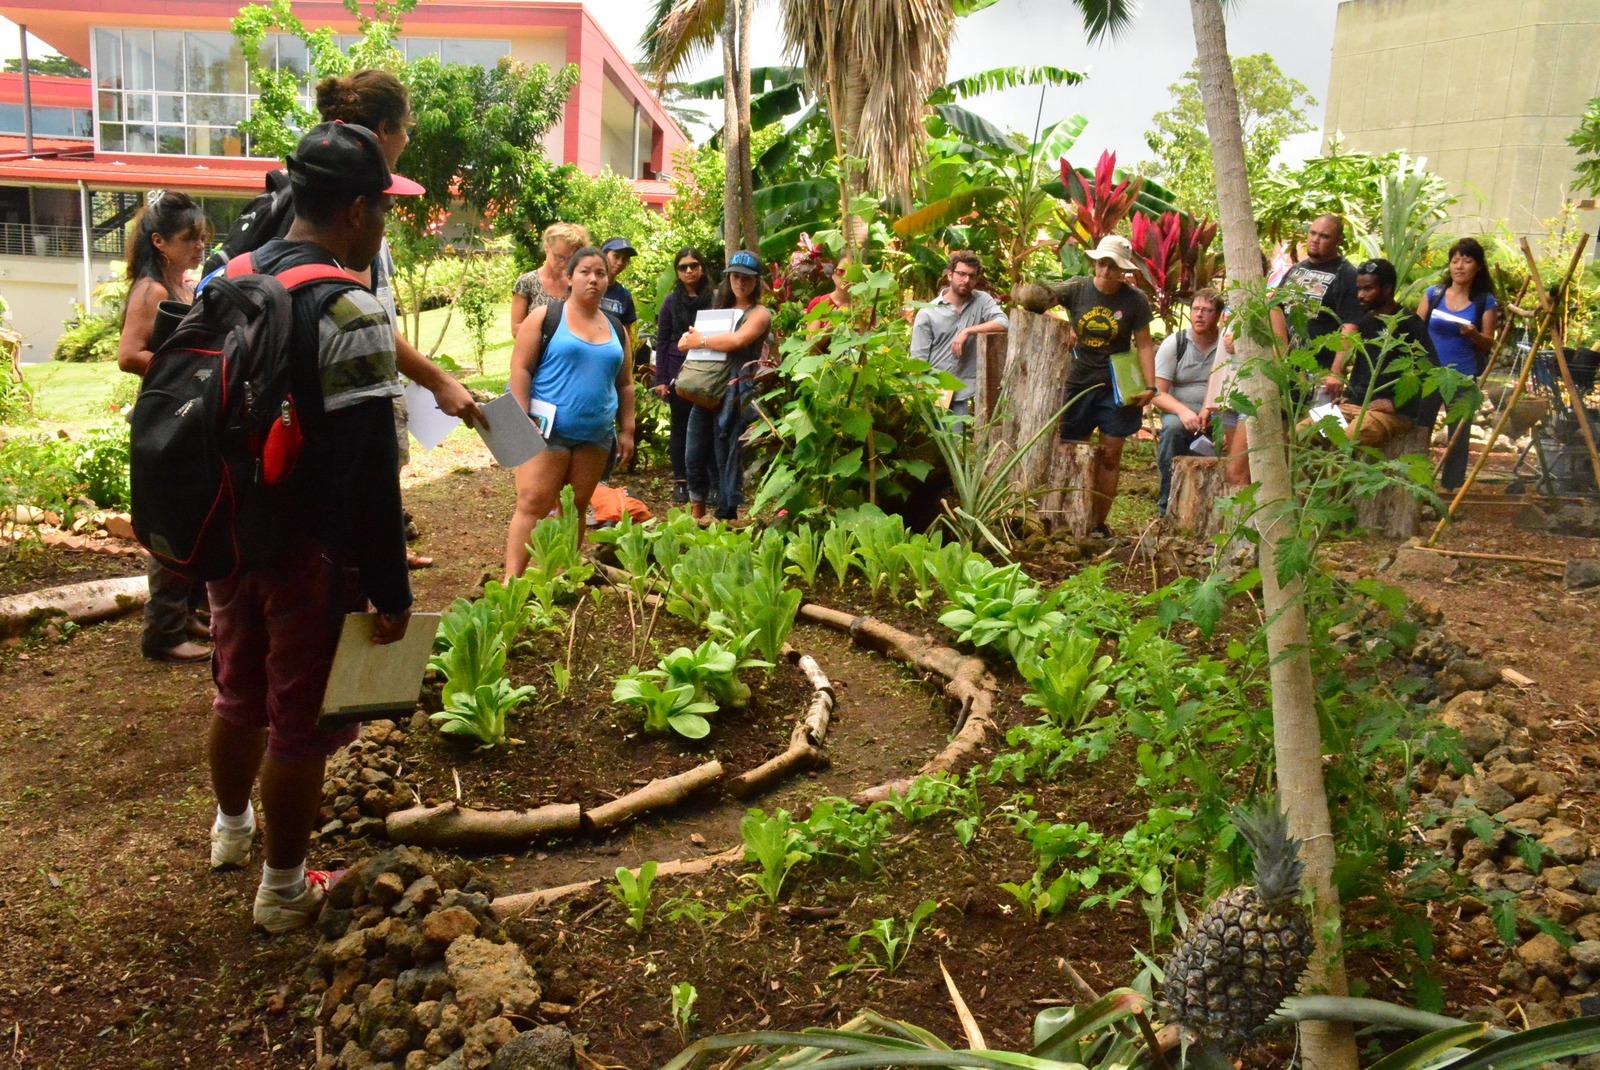 Students in the vegetable garden.